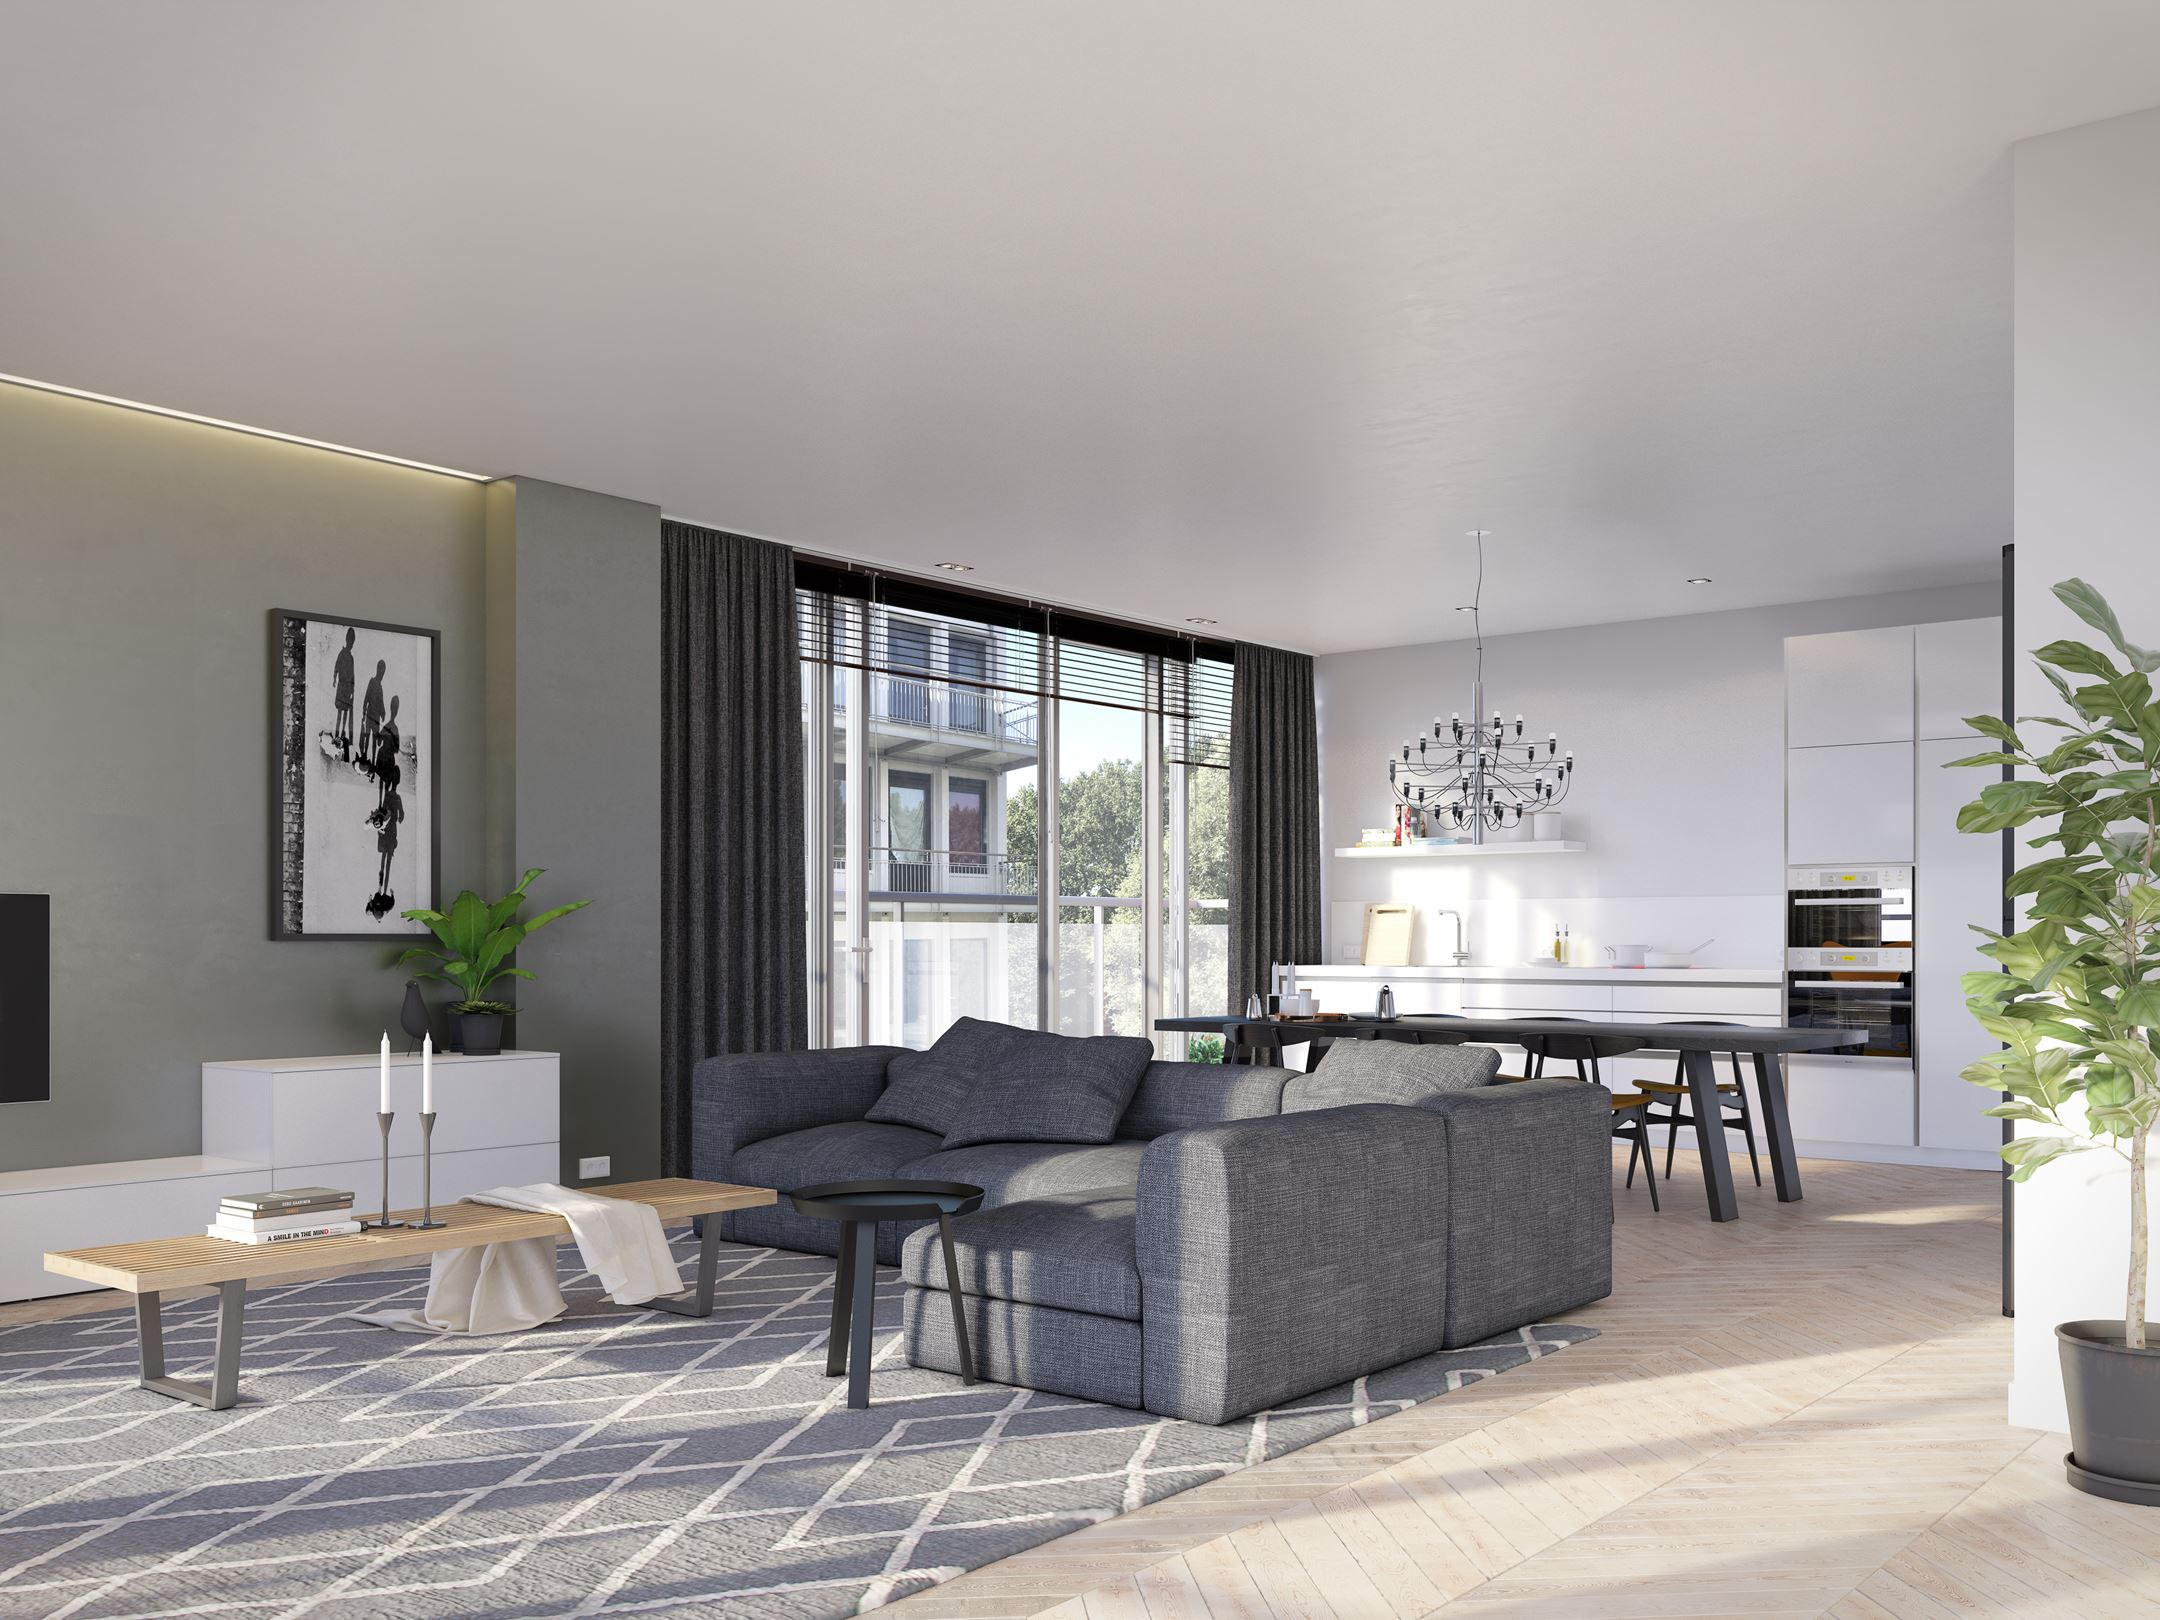 Appartement te koop: rise residence 4 kamer appartement (bouwnr. 1 ...